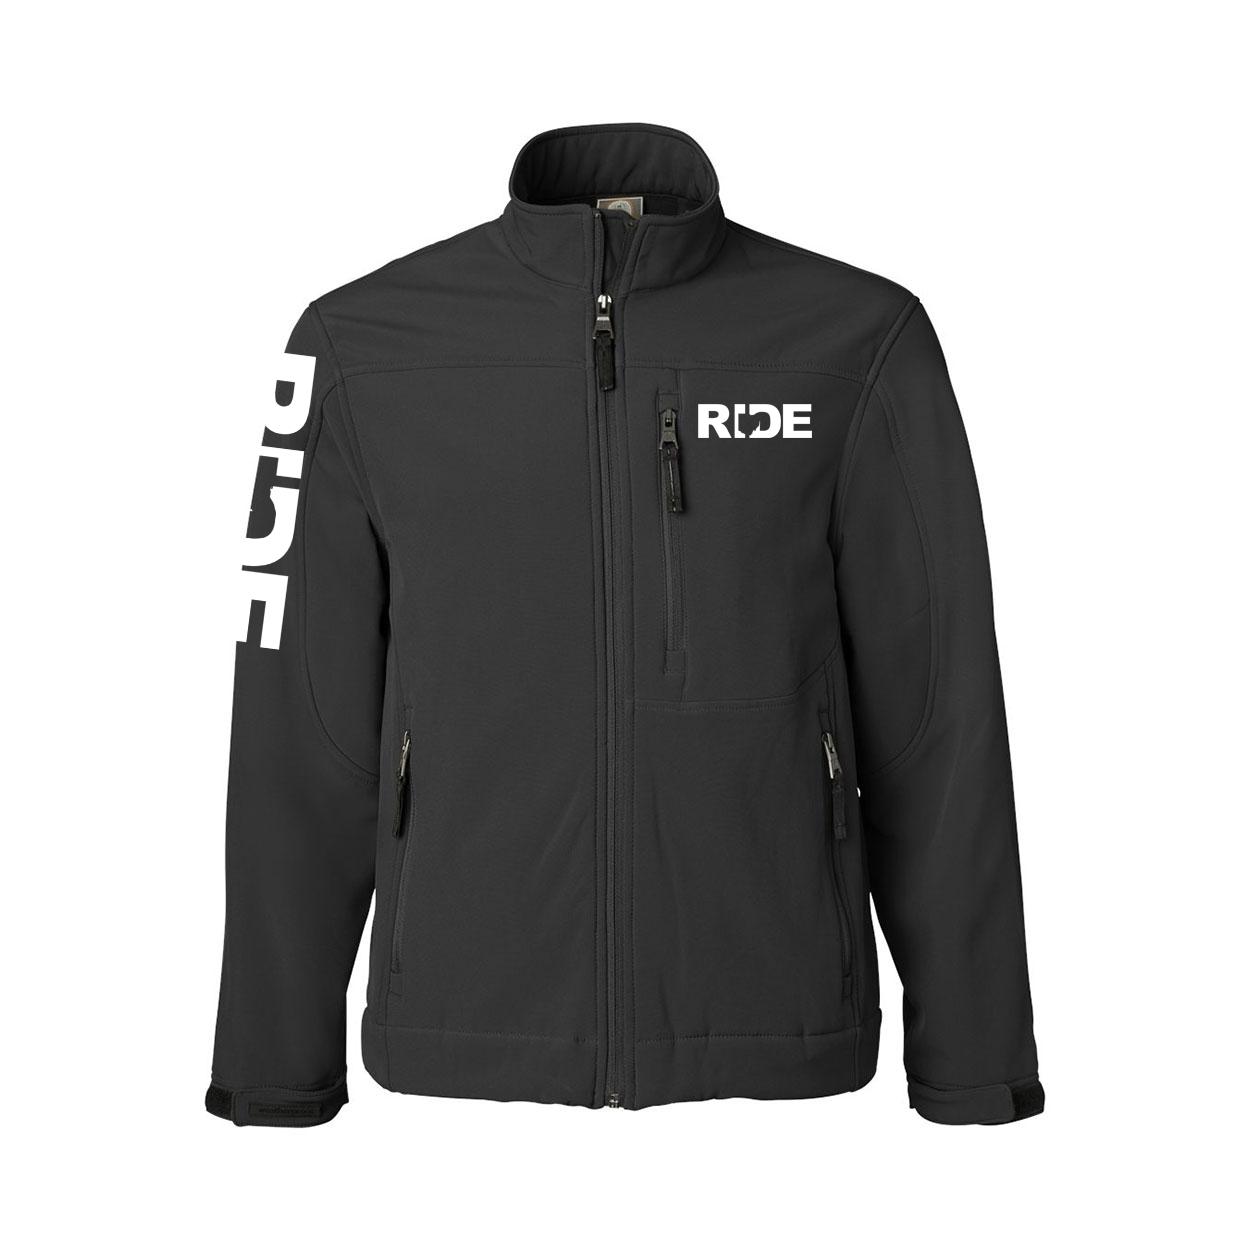 Ride Ohio Classic Soft Shell Weatherproof Jacket